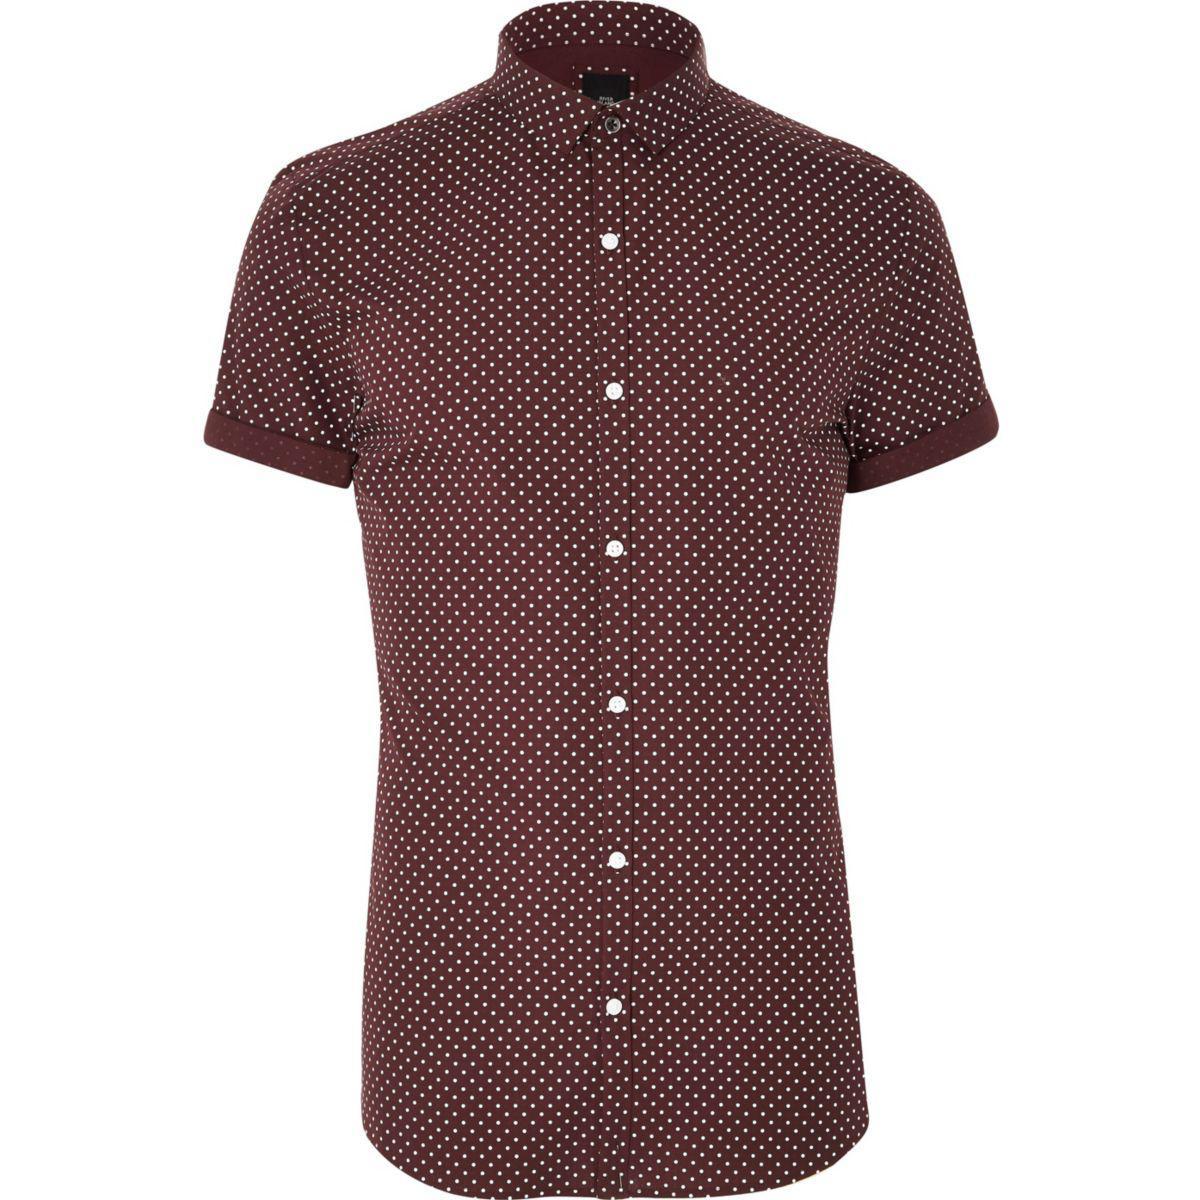 Lyst river island big and tall burgundy polka dot shirt for Big and tall purple dress shirts